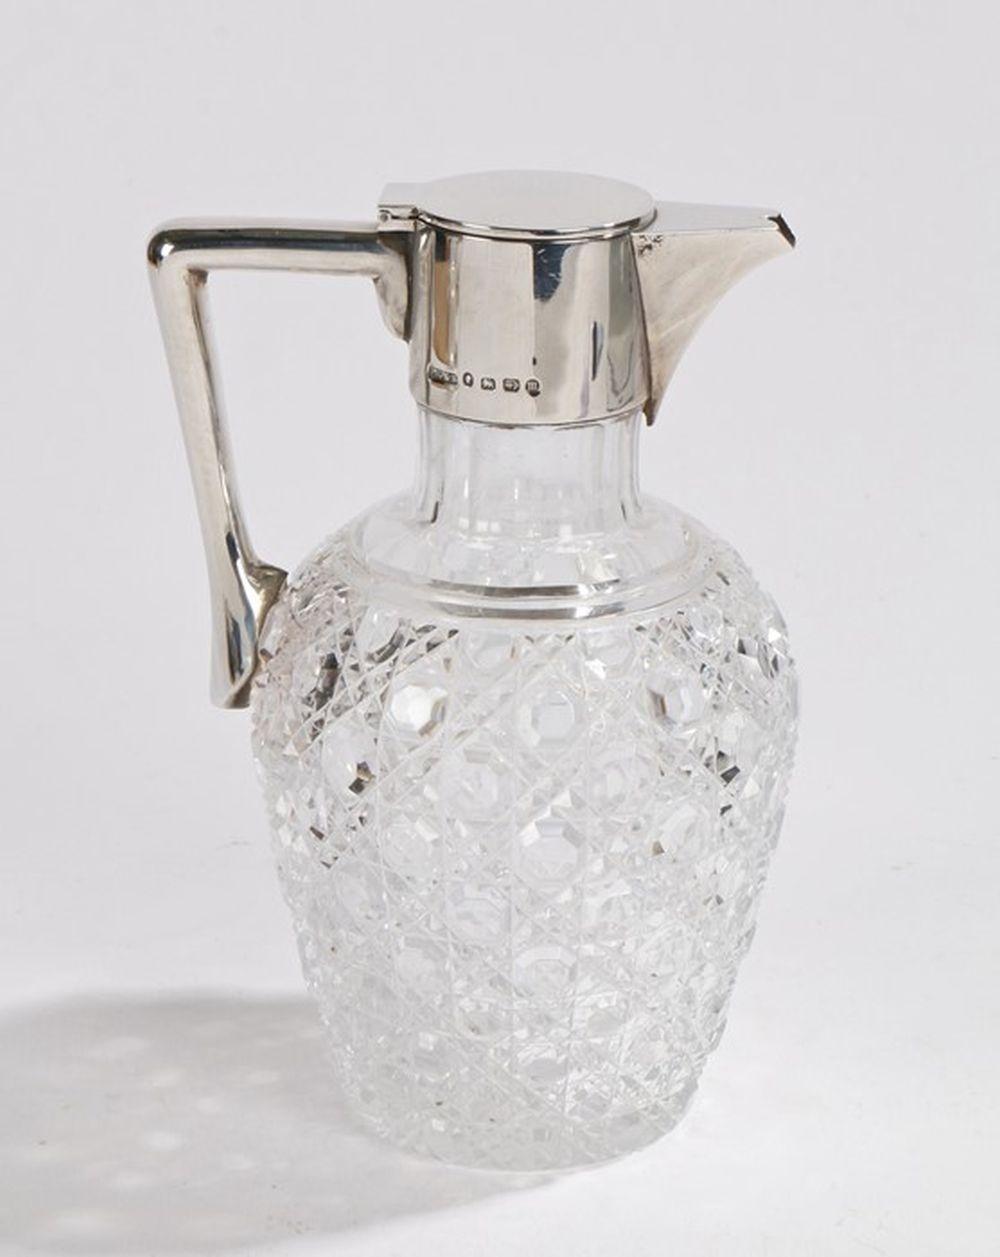 Victorian silver mounted claret jug, Birmingham 1886, maker John Grinsell & Sons, with angular handl